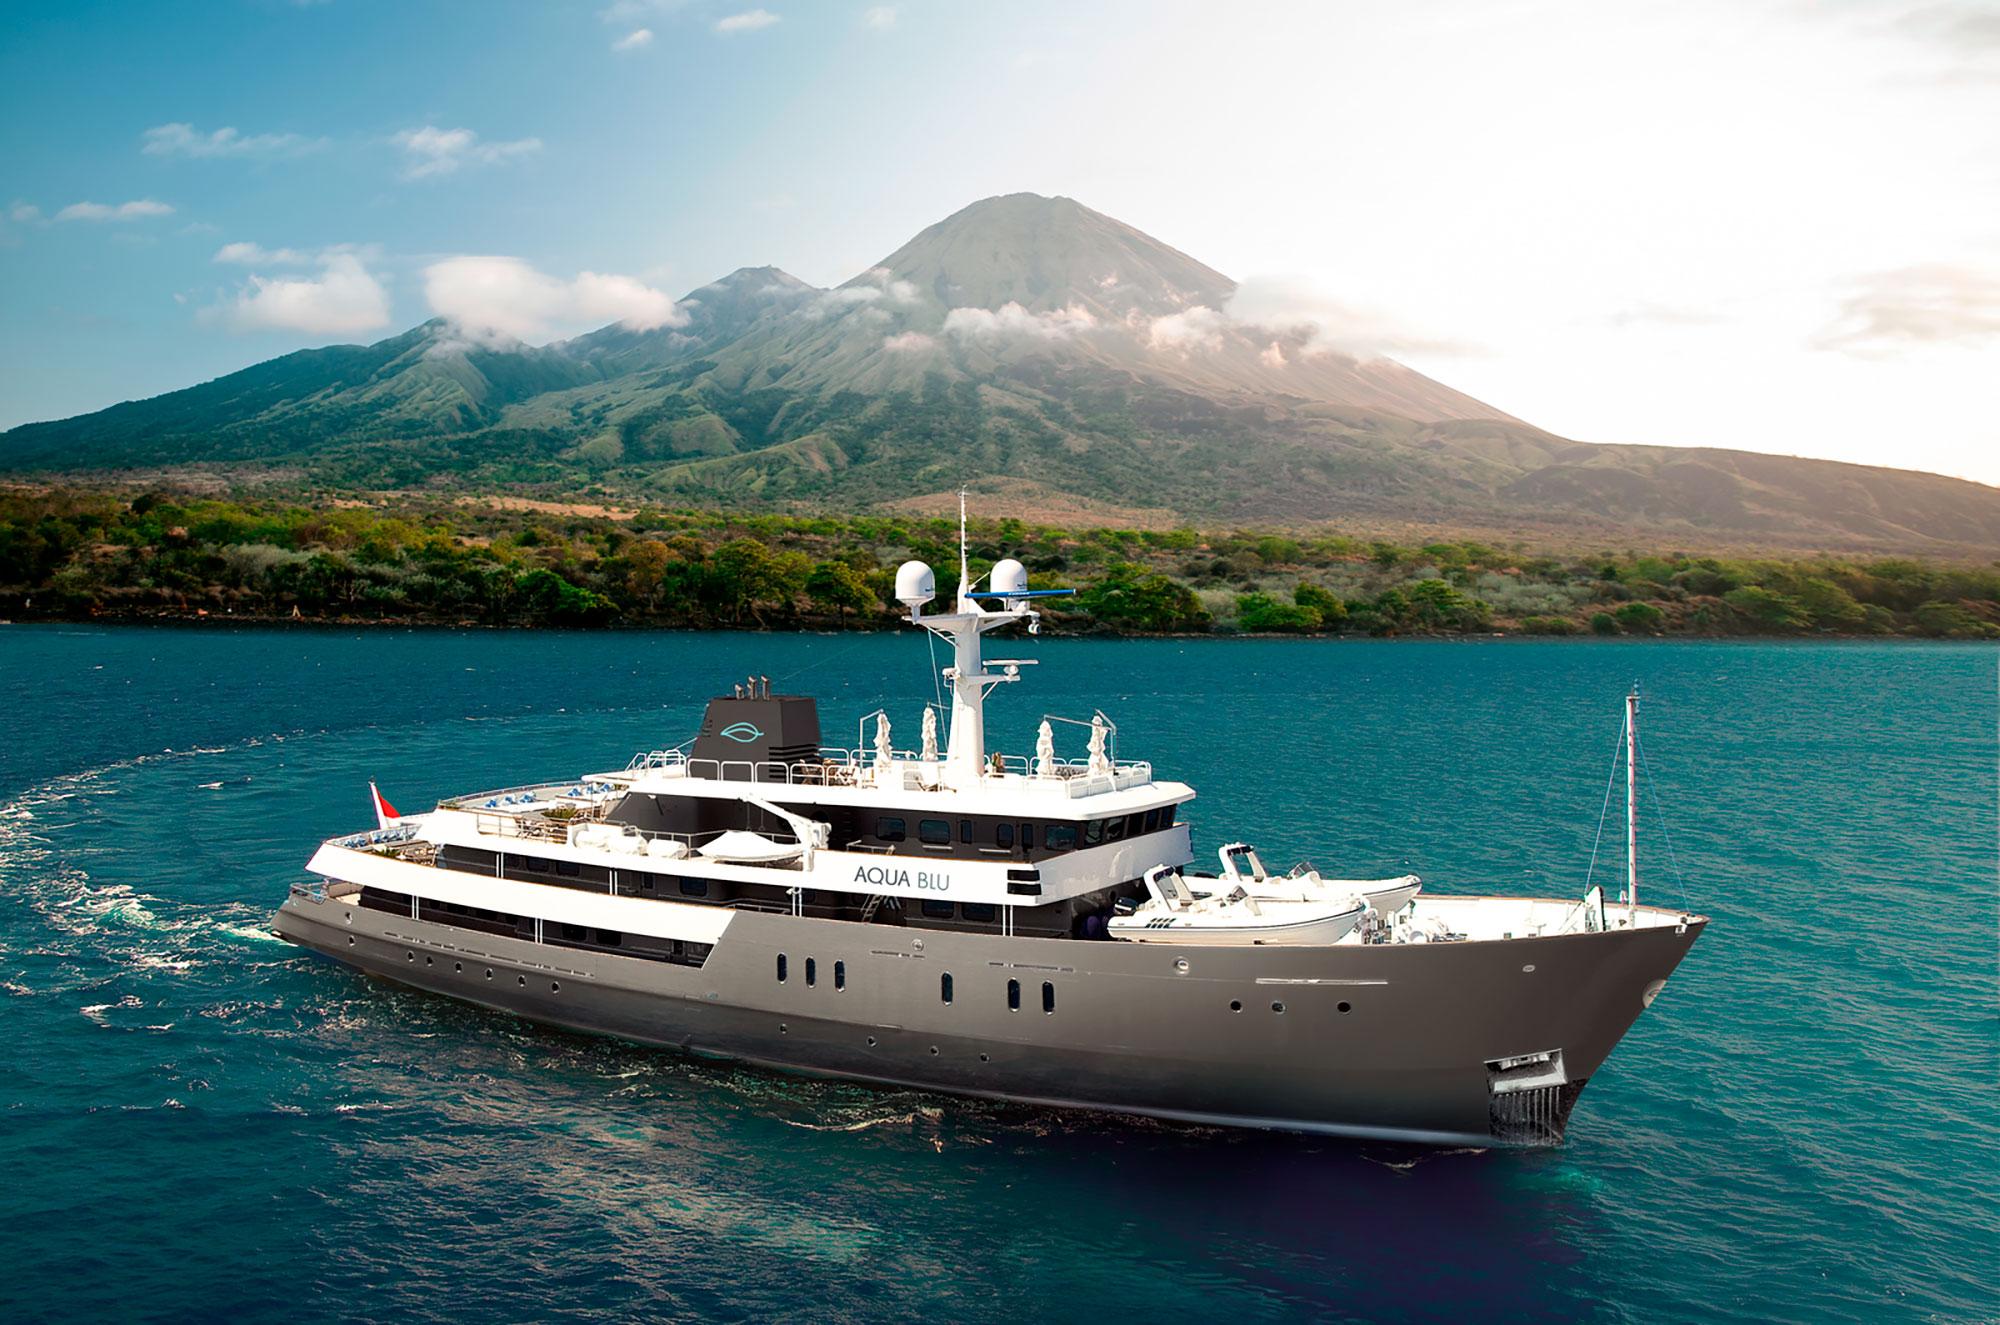 Crucero AQUA BLU de 12 noches - Spice Islands to Raja Ampat - Indonesia- imagen #8